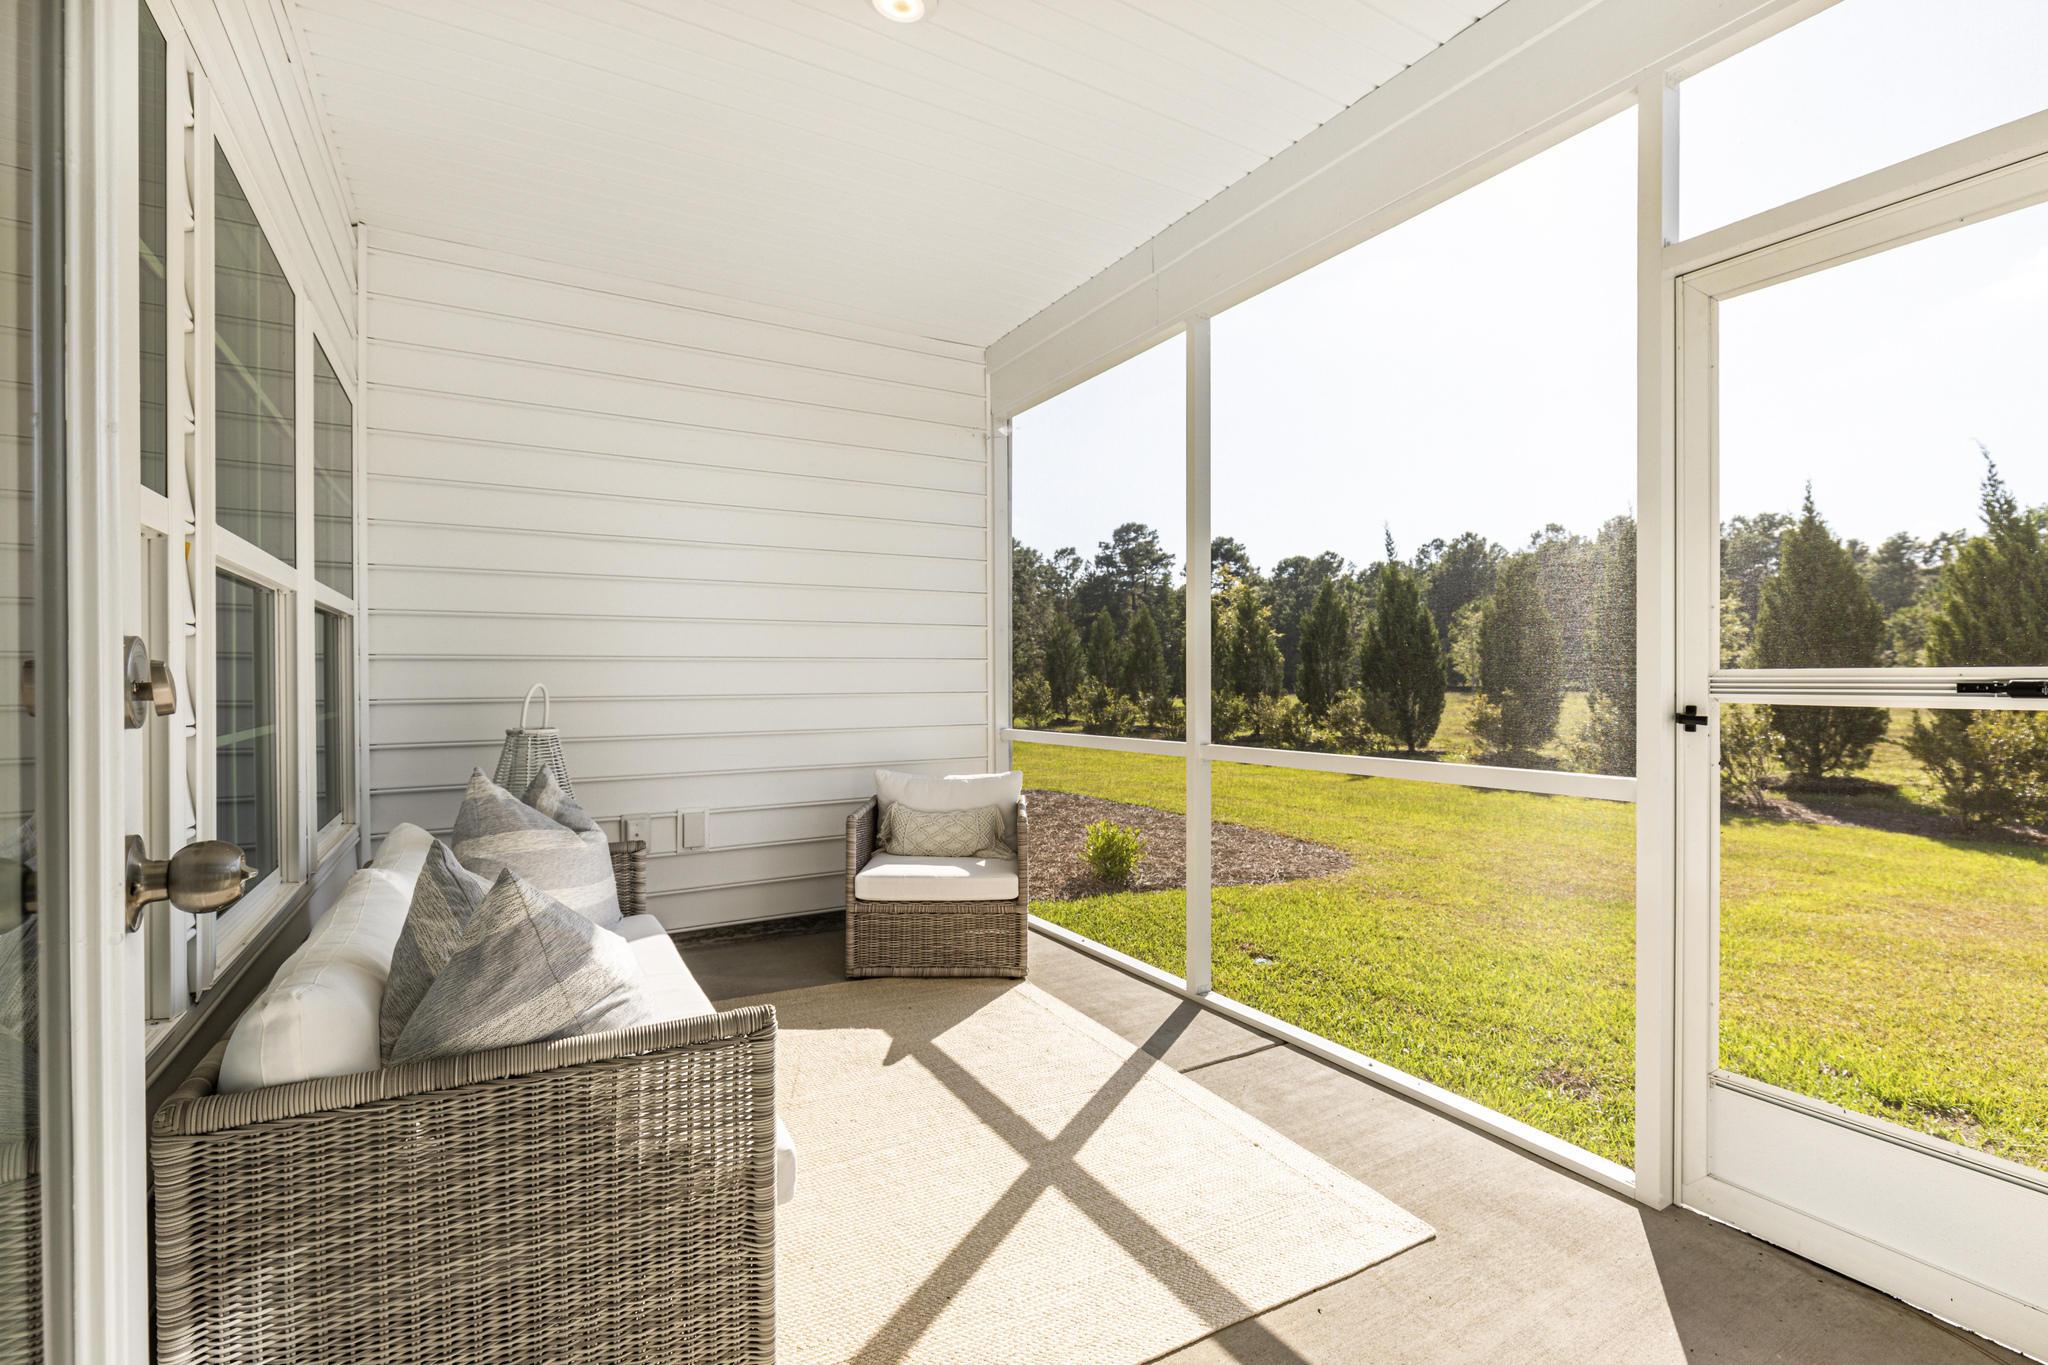 Cane Bay Plantation Homes For Sale - 189 Granton Edge, Summerville, SC - 19